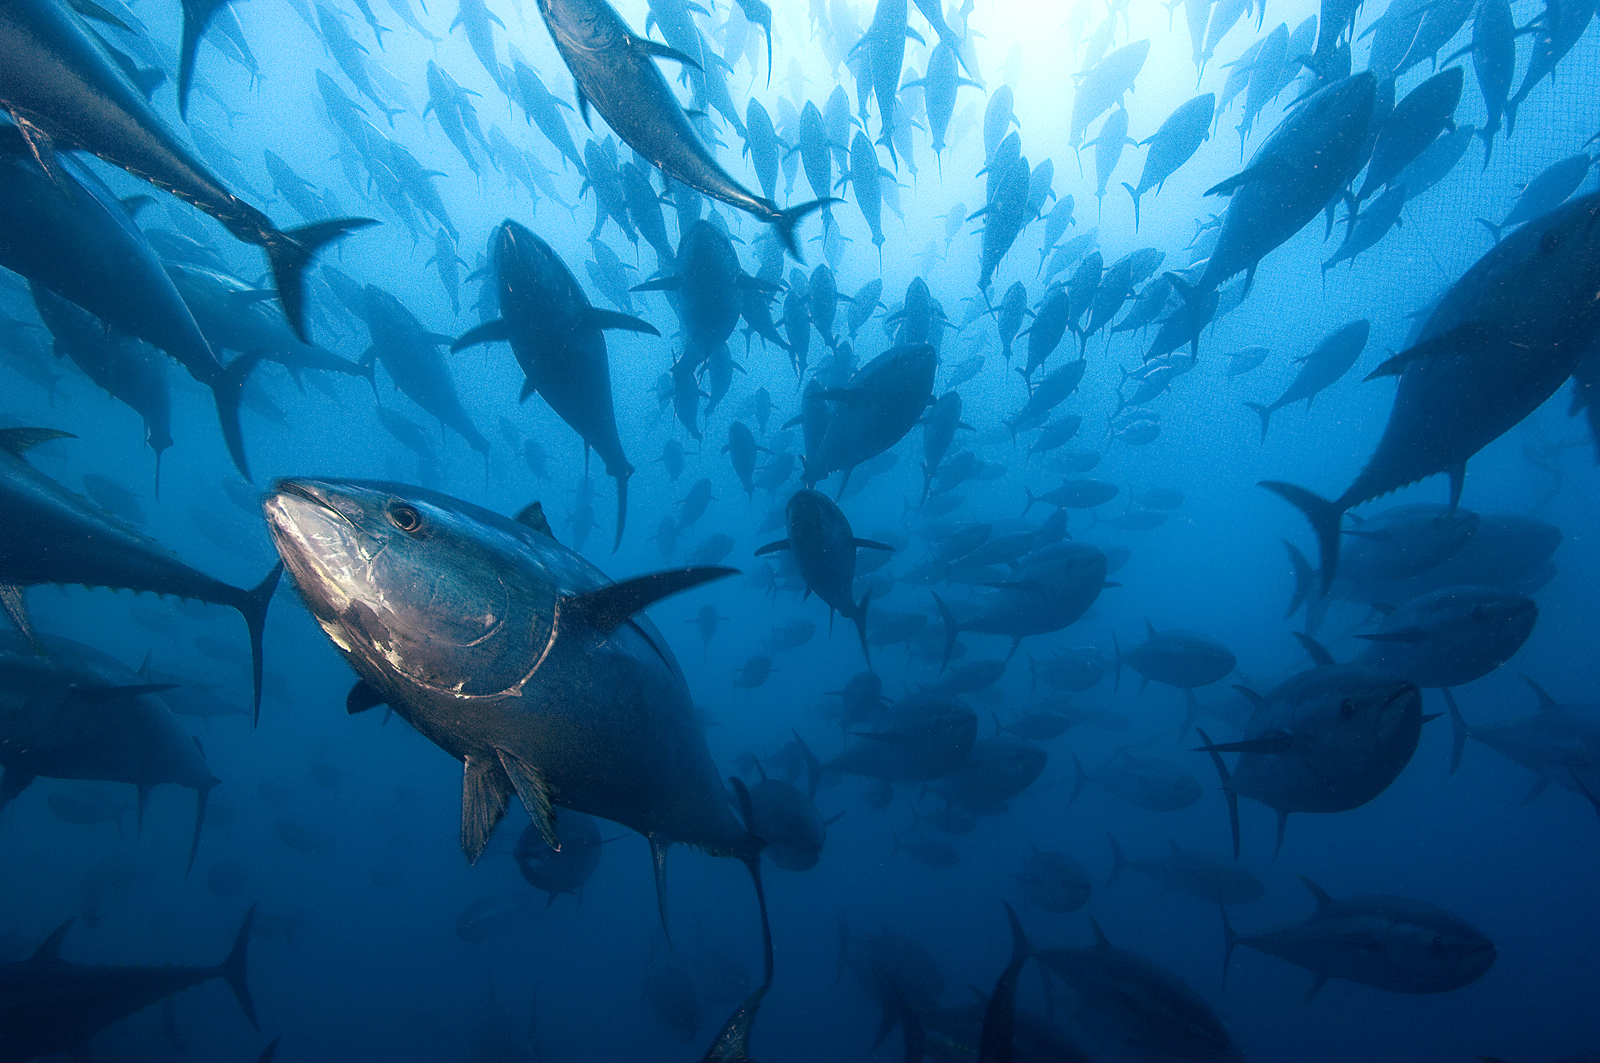 Bluefin Tuna in tuna ranching company's (Ecolo Fish) cages - Mediterranean Sea, Spain